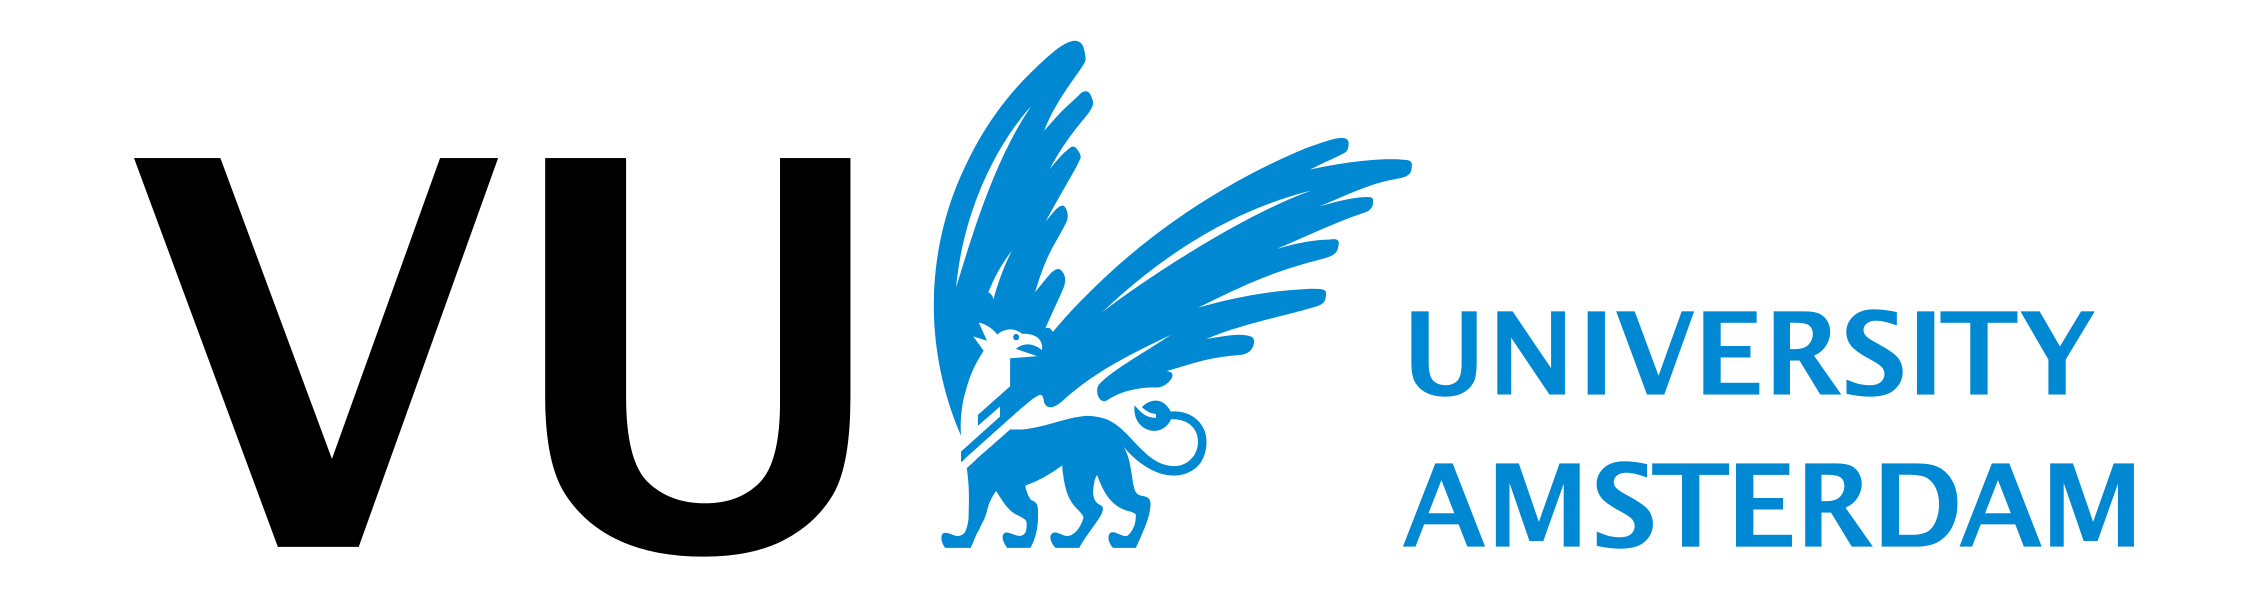 images/logo_vu.png